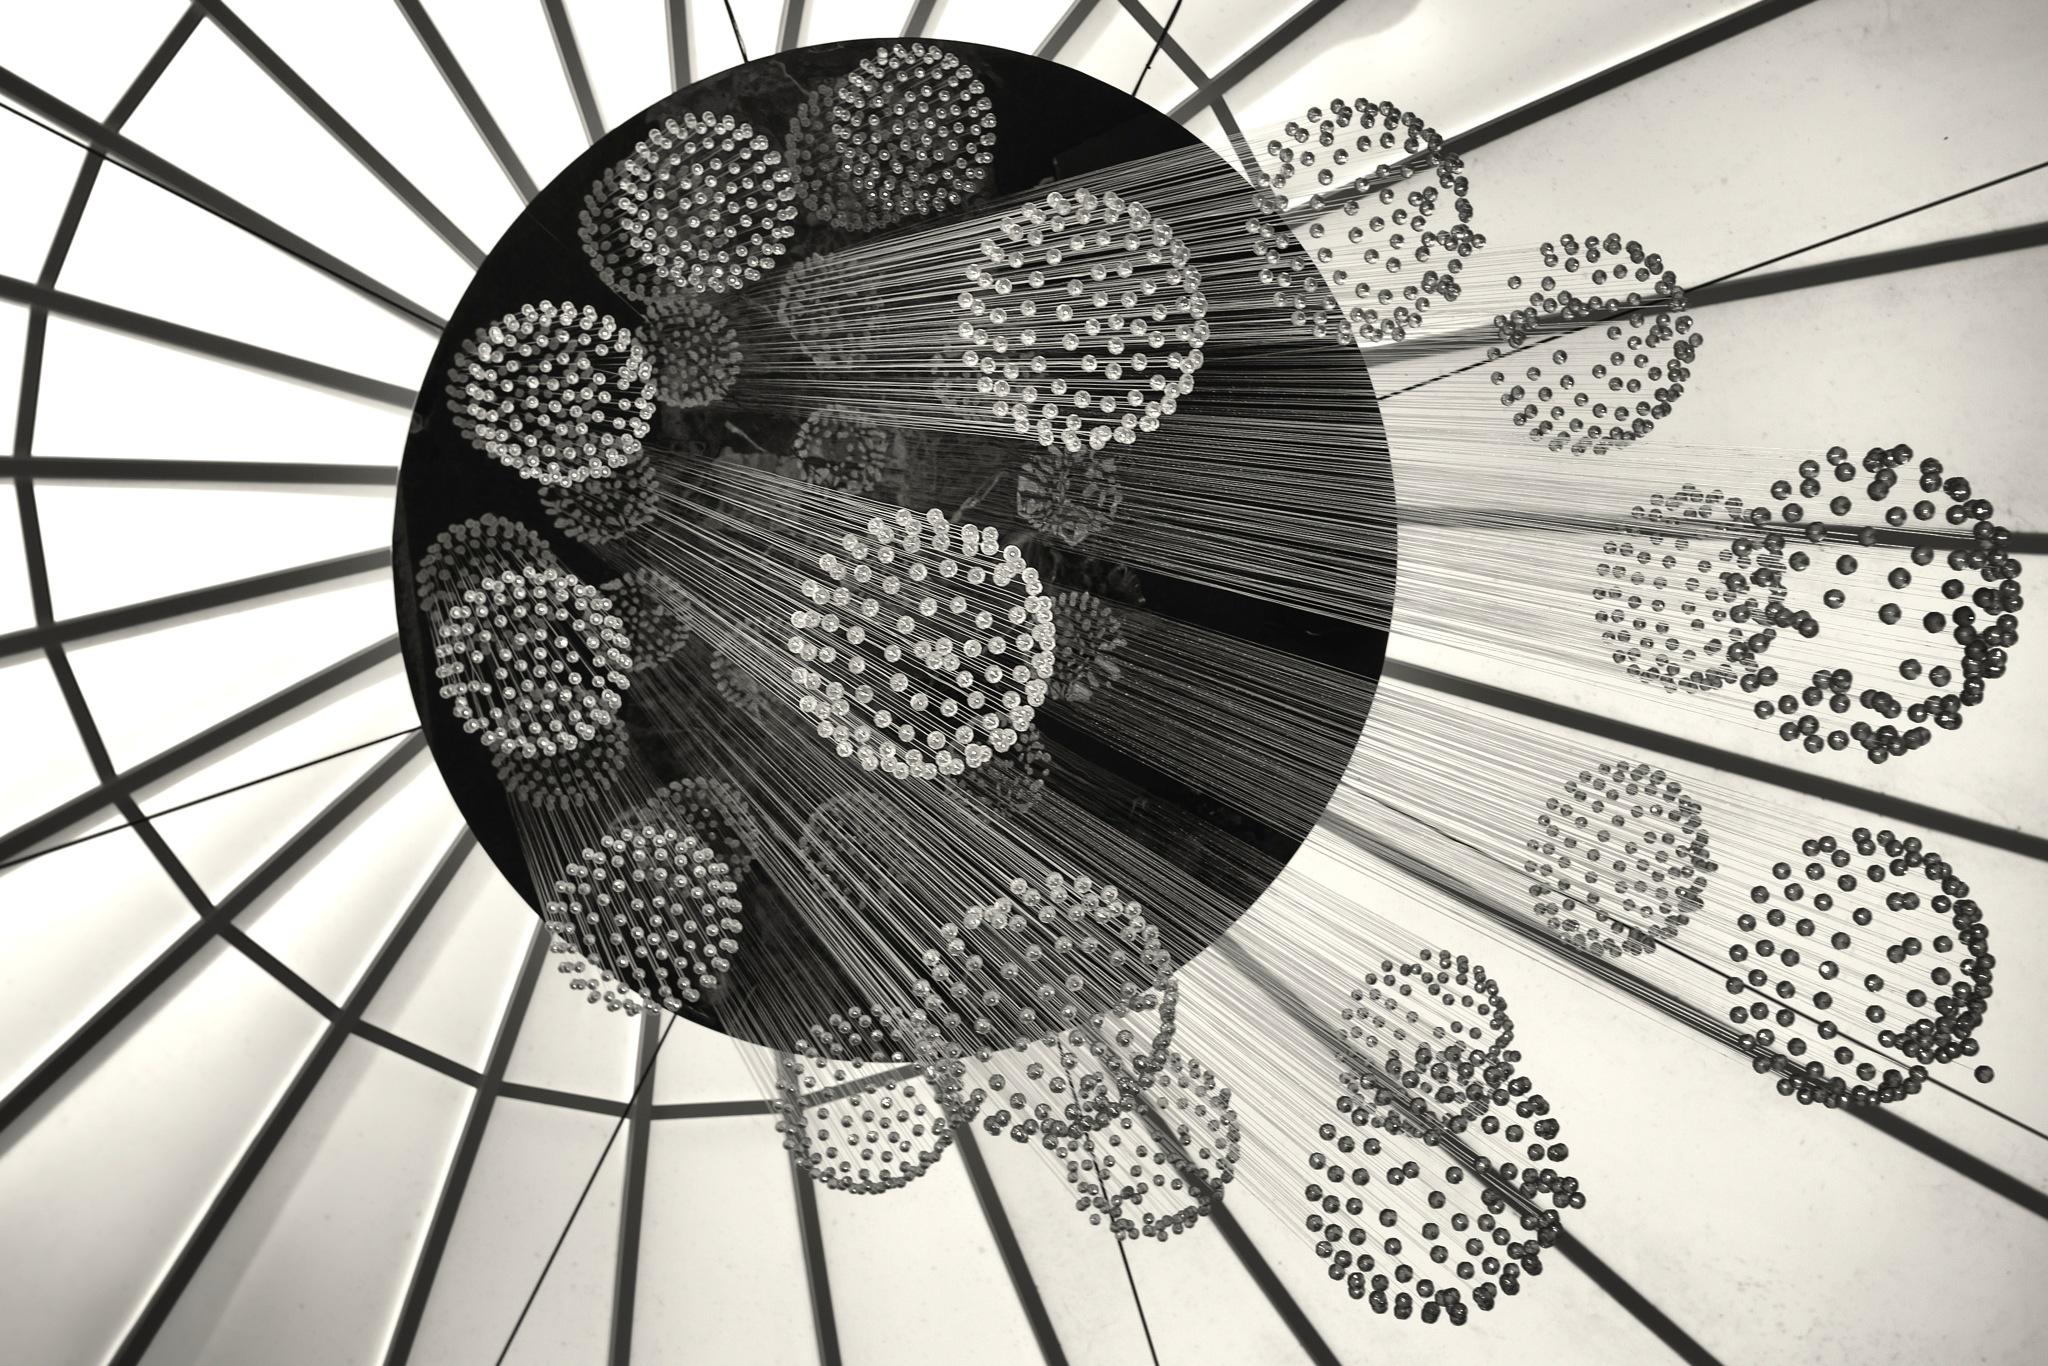 Chrystal Bells by Michael Feistel